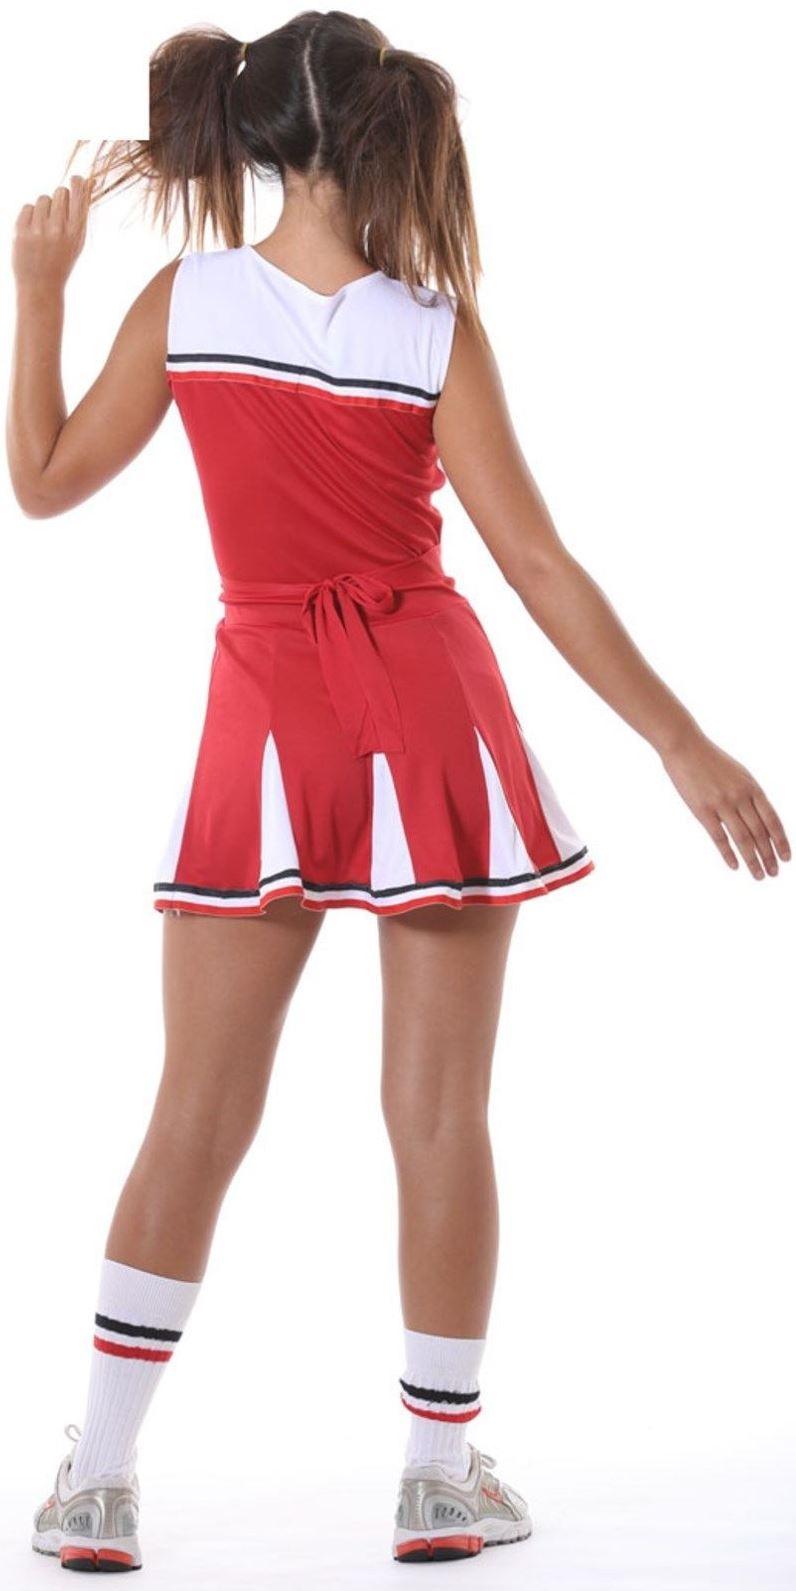 cheerleader-1